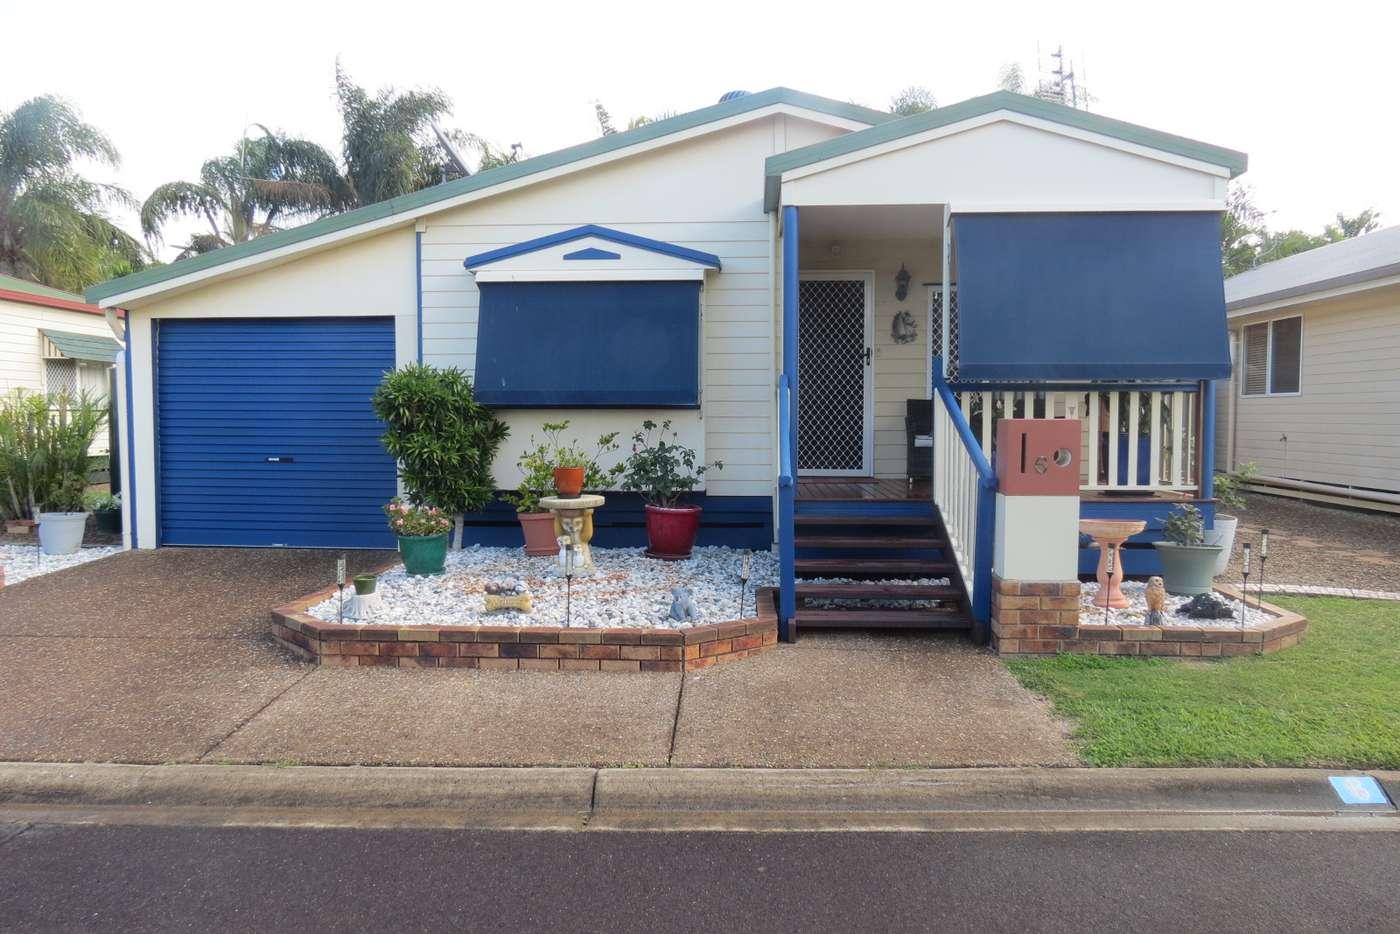 Main view of Homely house listing, 6 Wayamba Way, 59 Truro Street, Torquay QLD 4655